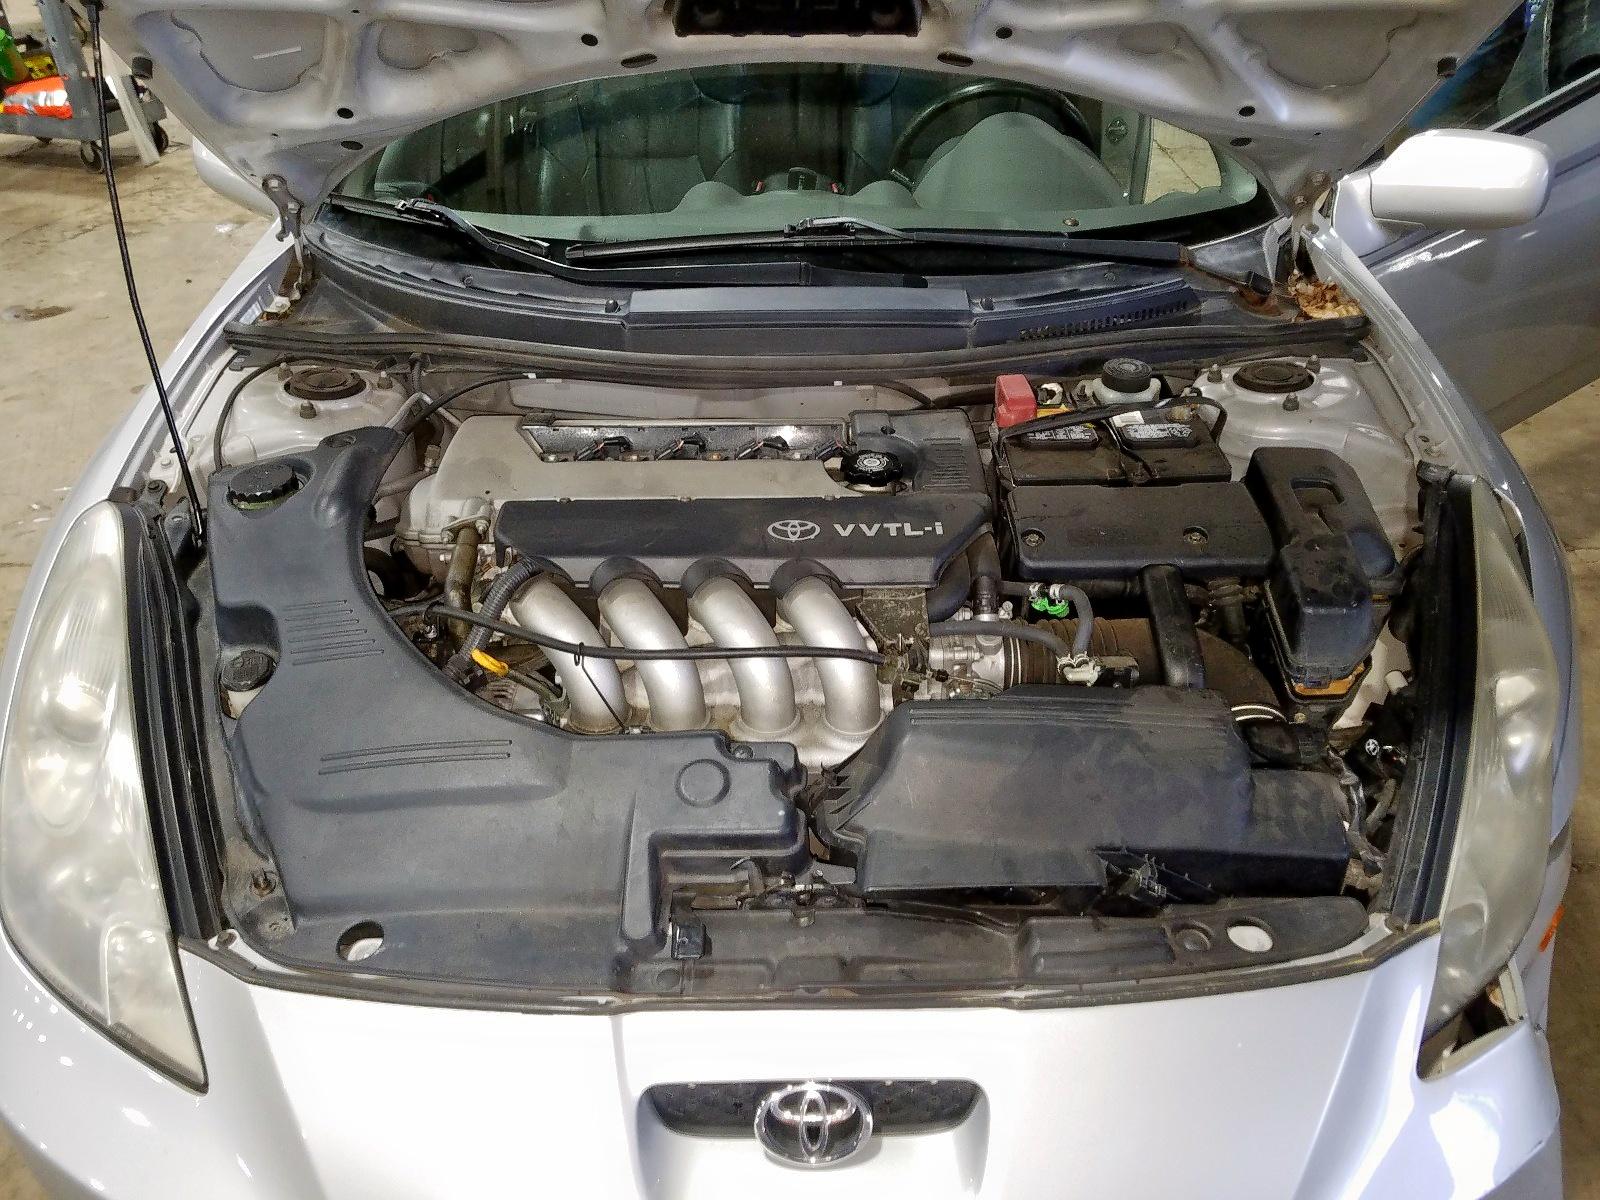 JTDDY38T020052533 - 2002 Toyota Celica Gt- 1.8L inside view